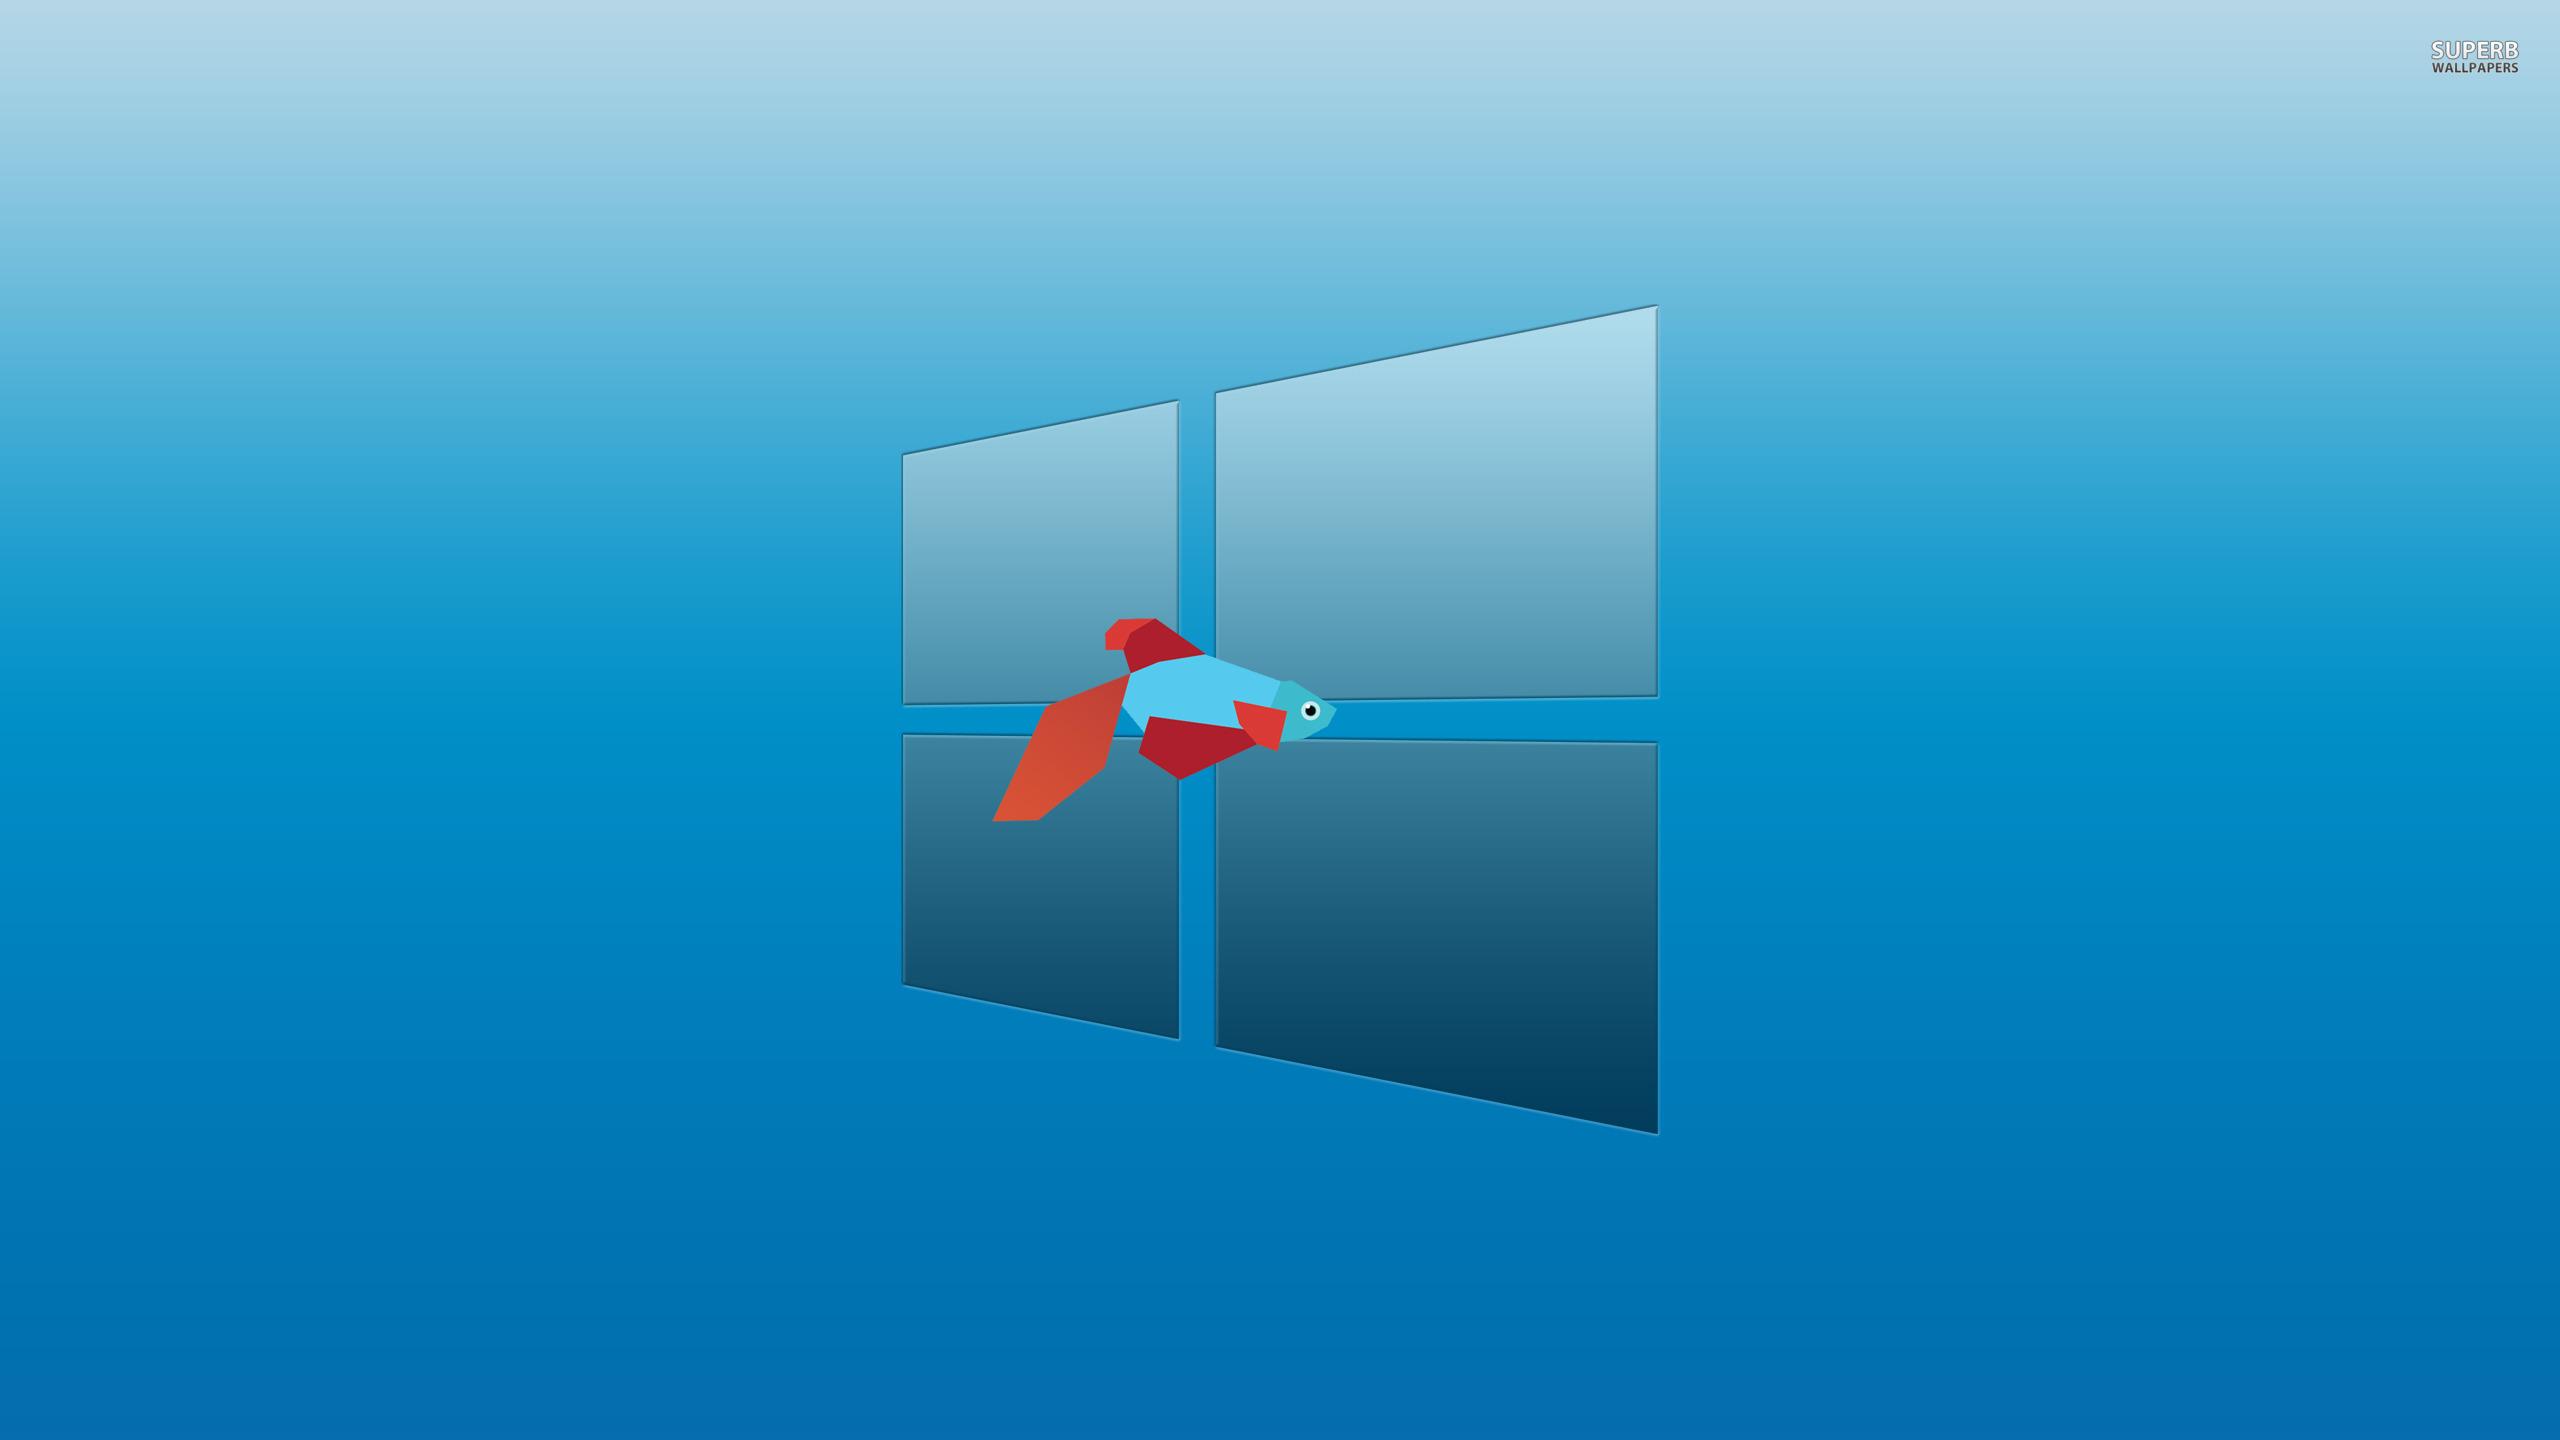 Wallpapers For Windows Desktop Wallpaper 2560x1440